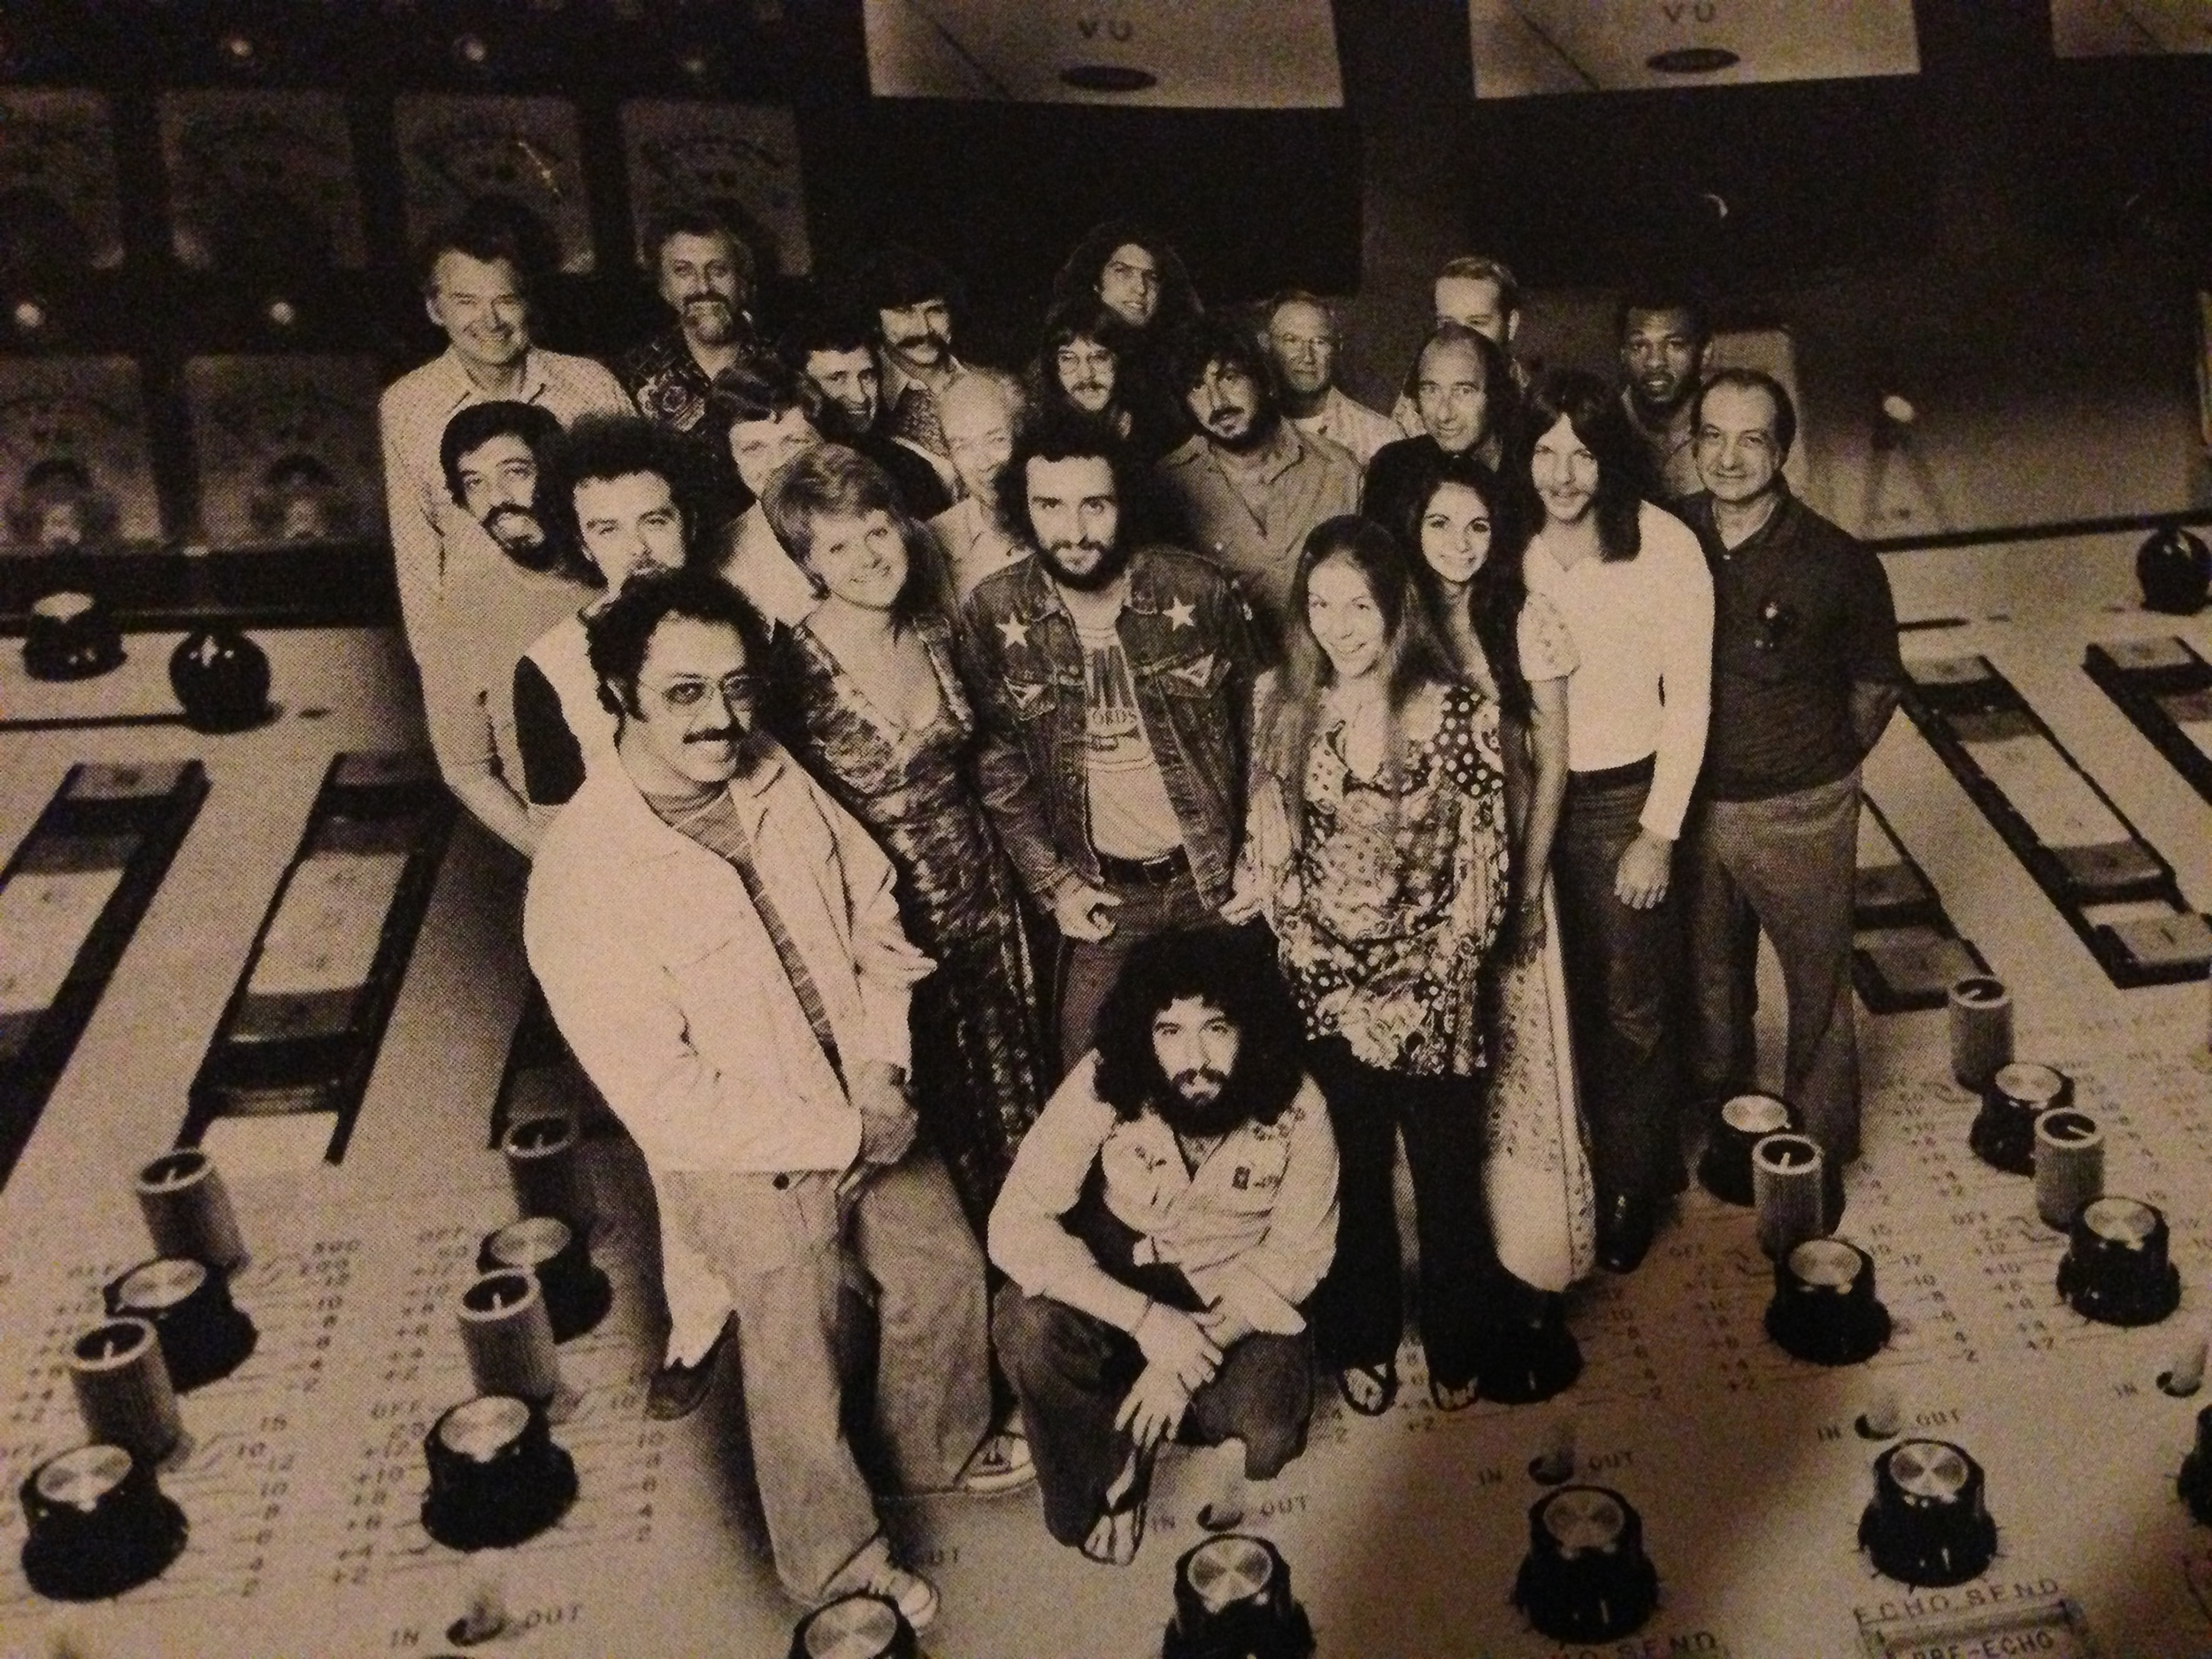 Studio Staff Publicity Shot.  Who's the guy kneeling?